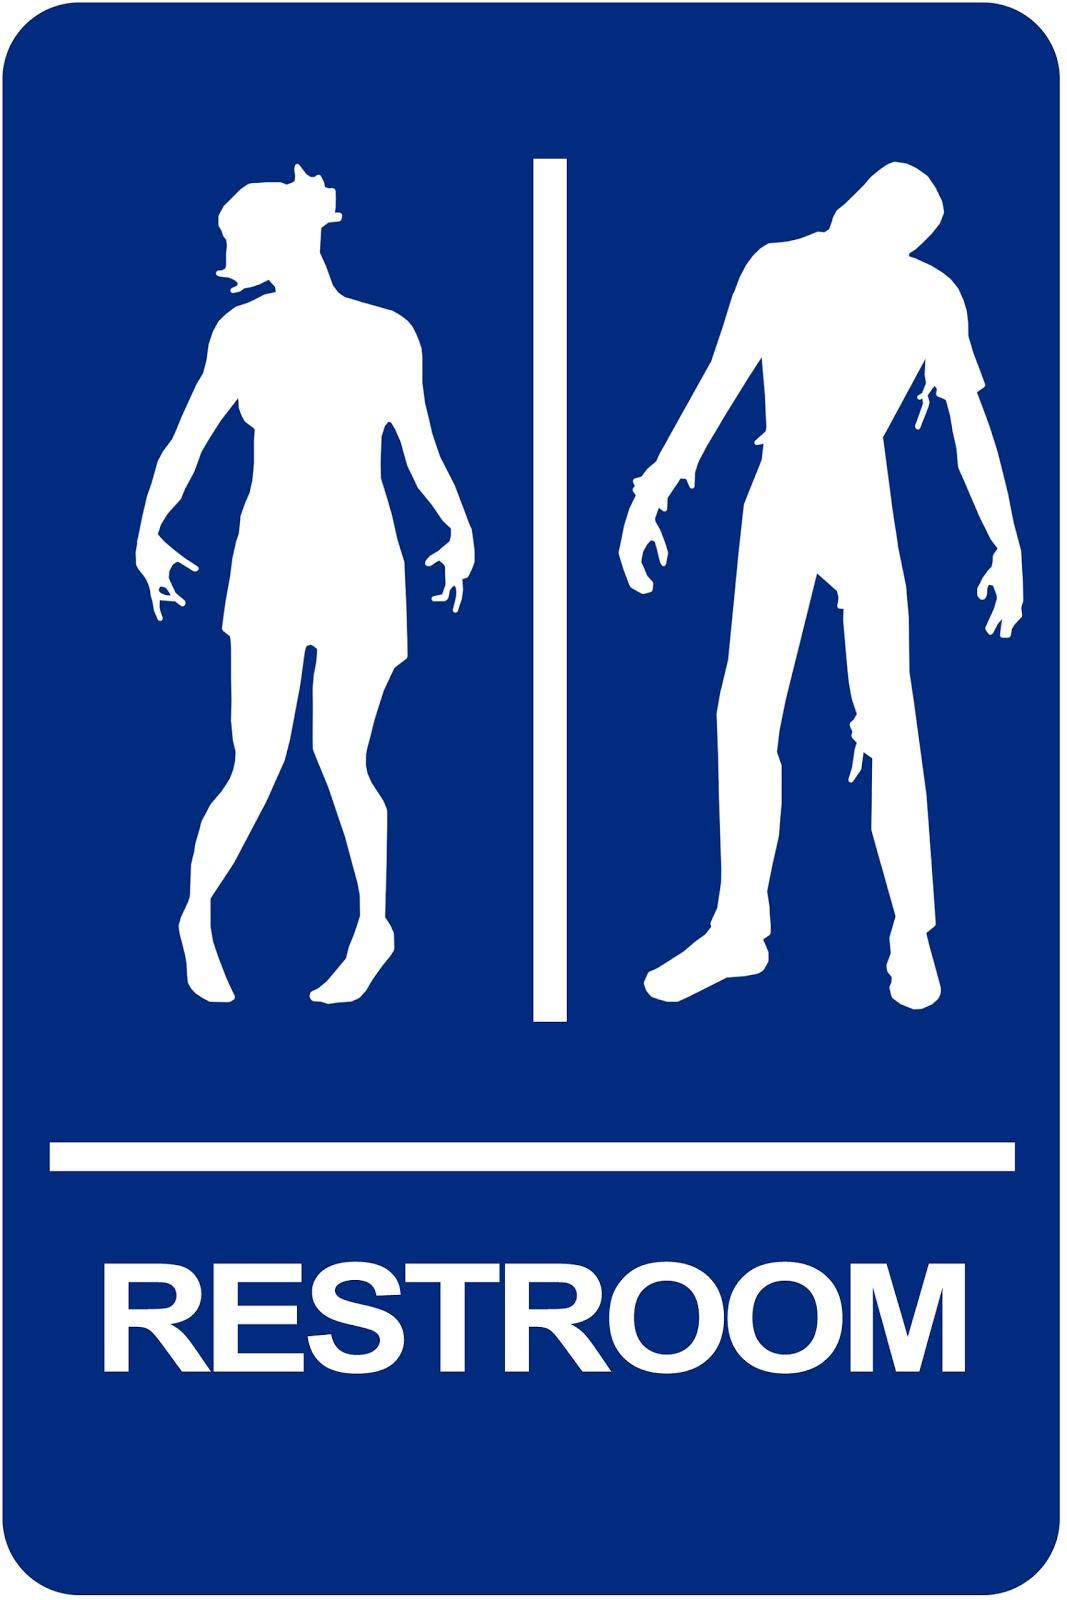 Http Zombiecreep Blogspot Com 2012 05 Restroom Html